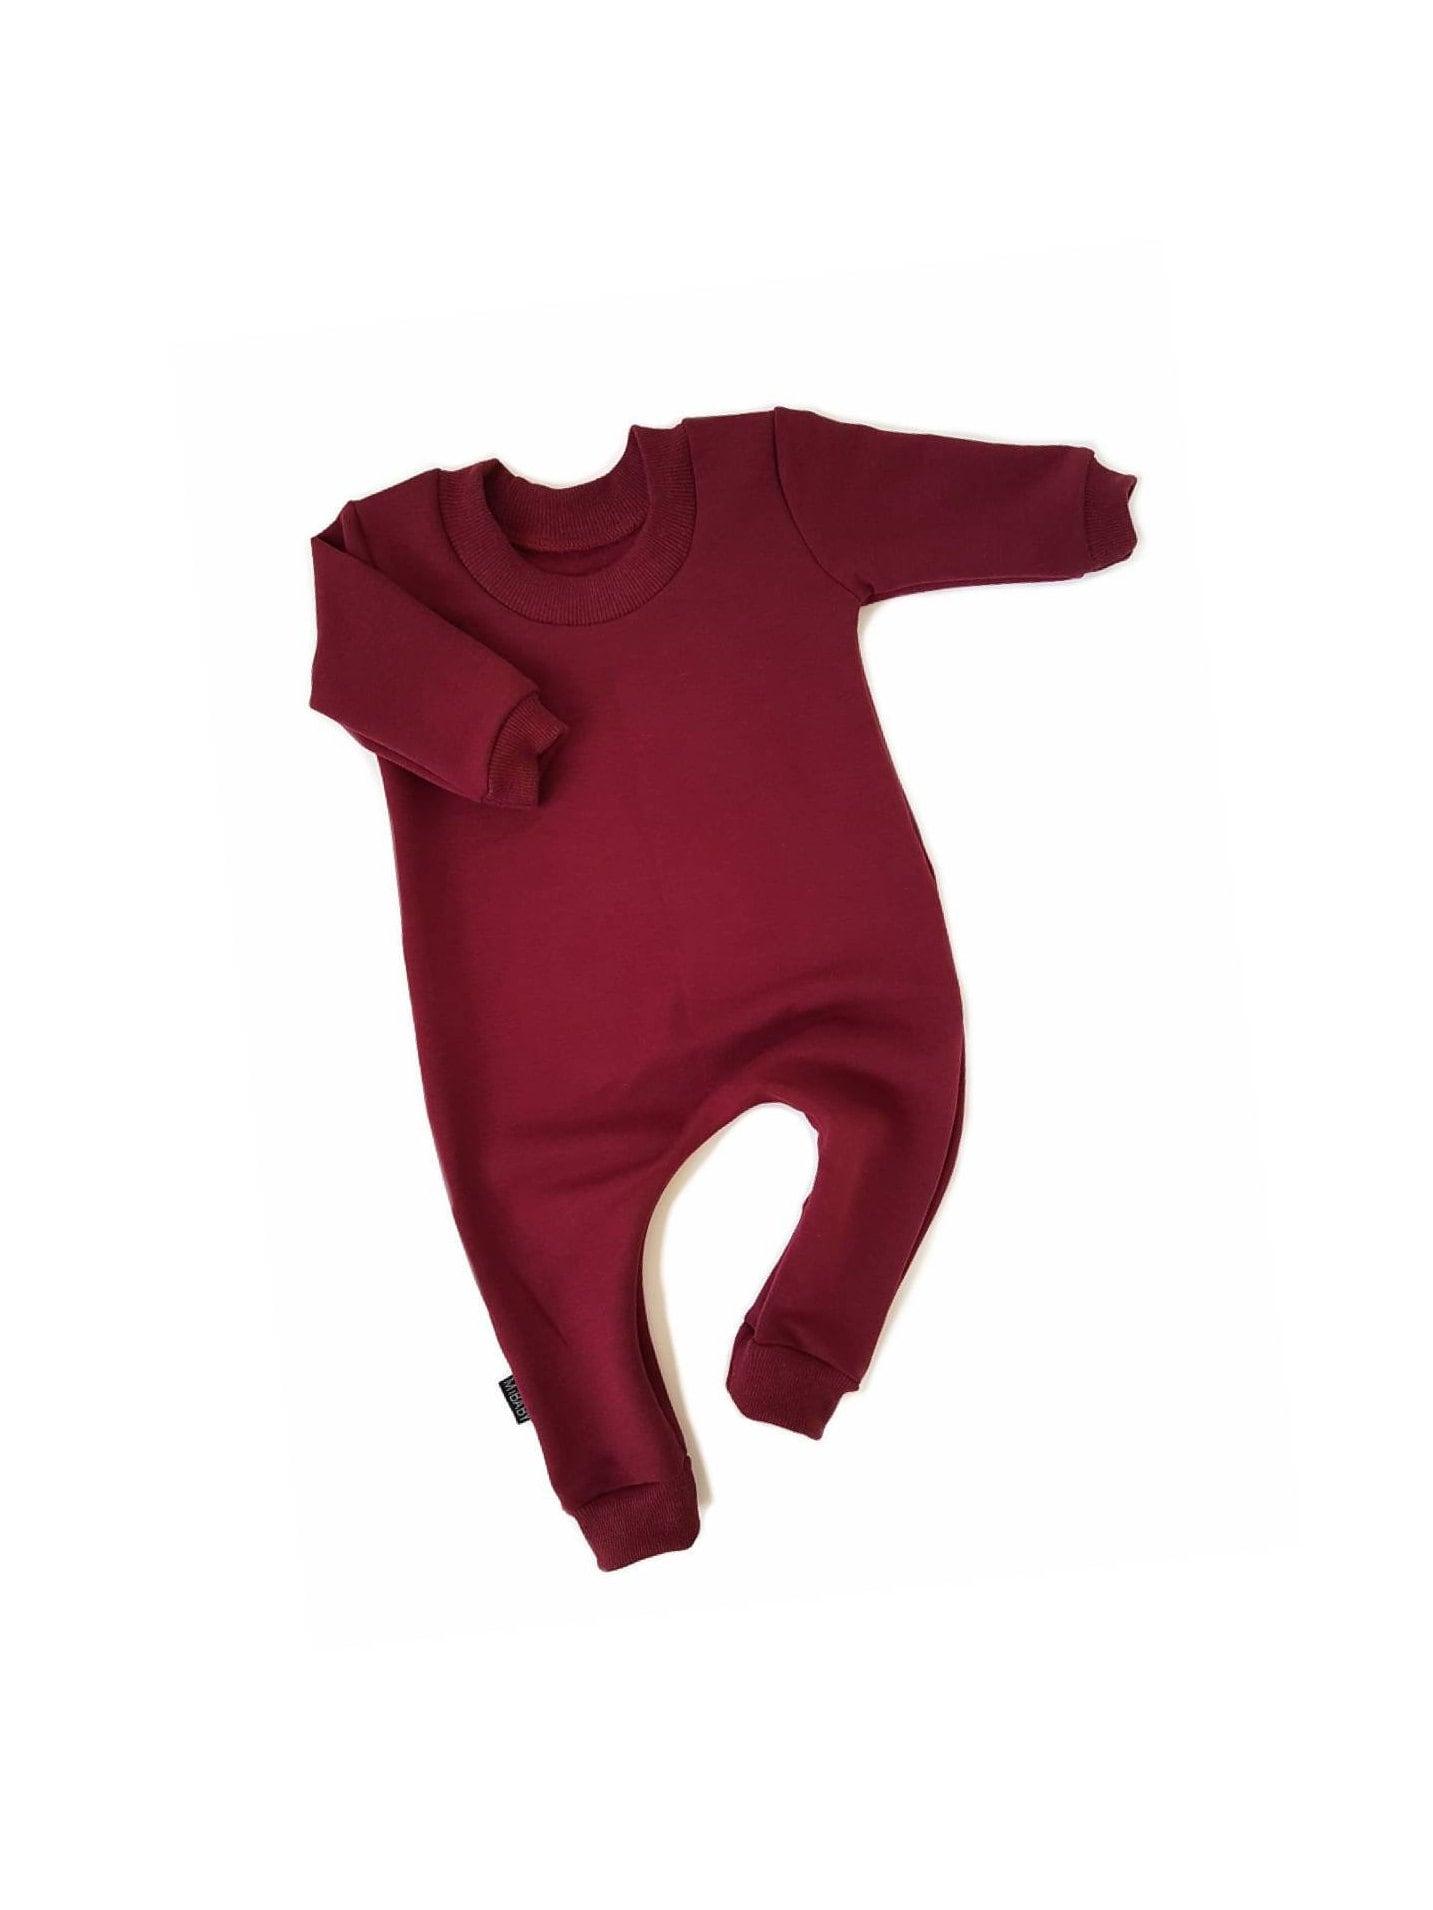 6626957912a8 WINE Sweatshirt Baby Romper   Toddler Romper One Piece Zipper ...